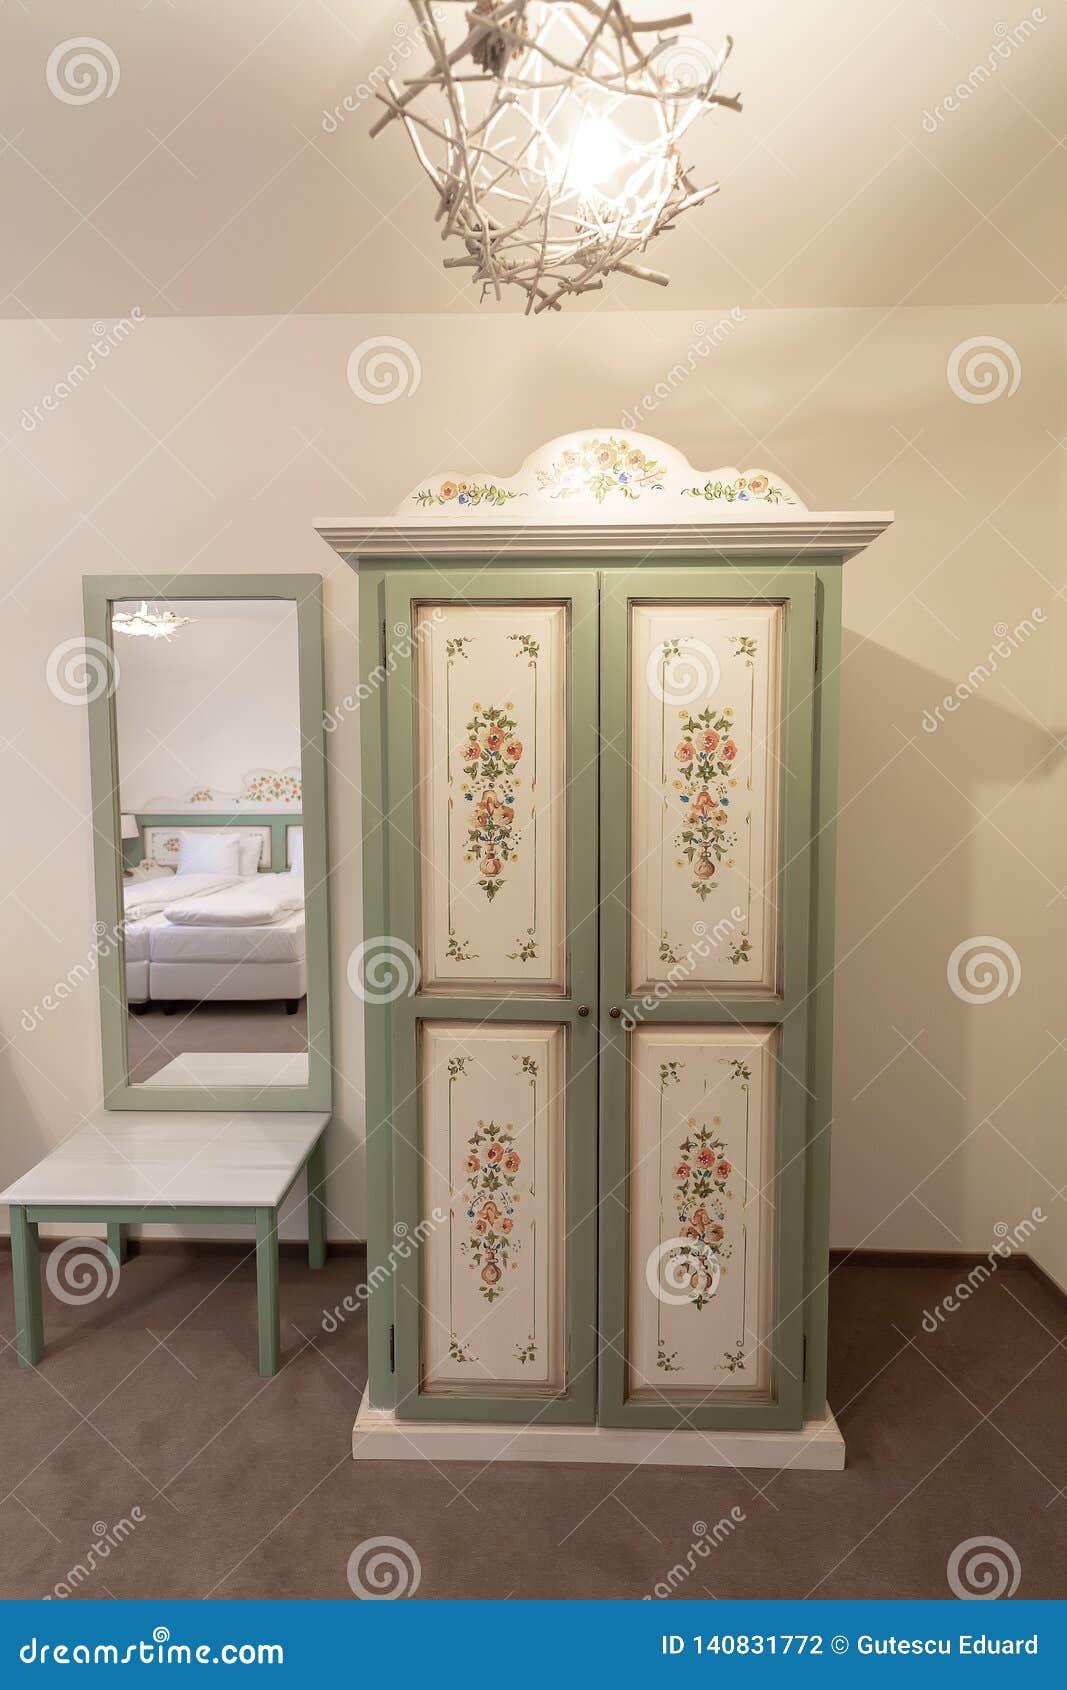 Hotel Room Furniture: Inside Hotel Room On Luxury Resort, Traditional Tourism